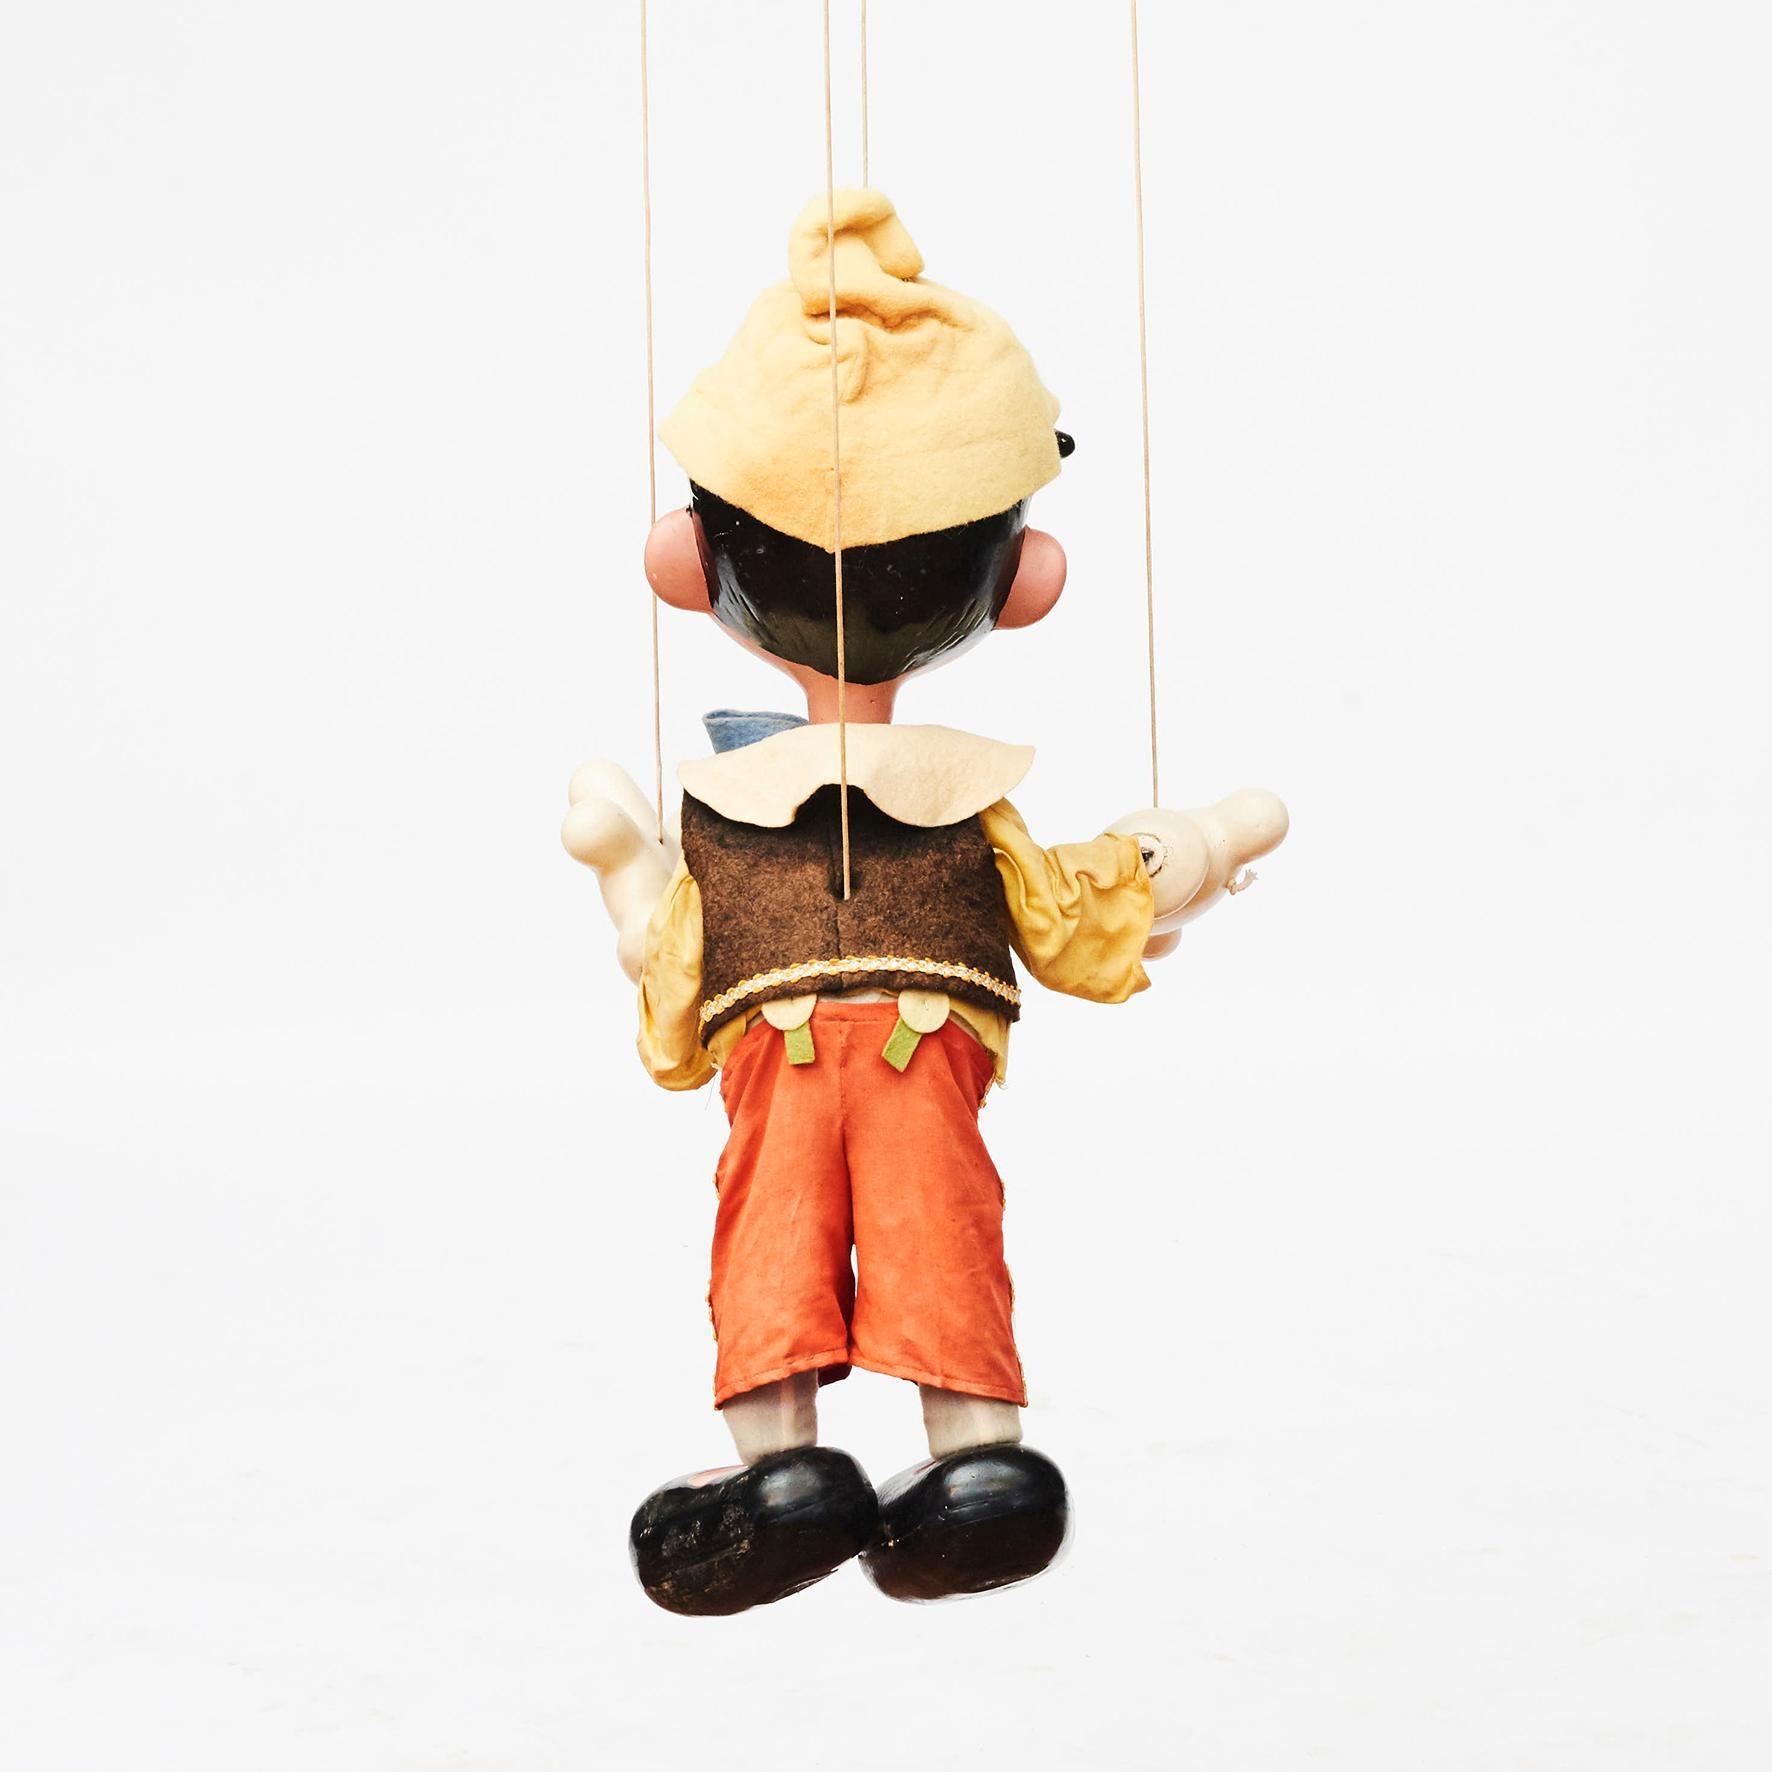 Antique Pinocchio Puppet Antique Pelham Puppets Antique Disney Toy Vintage Disney